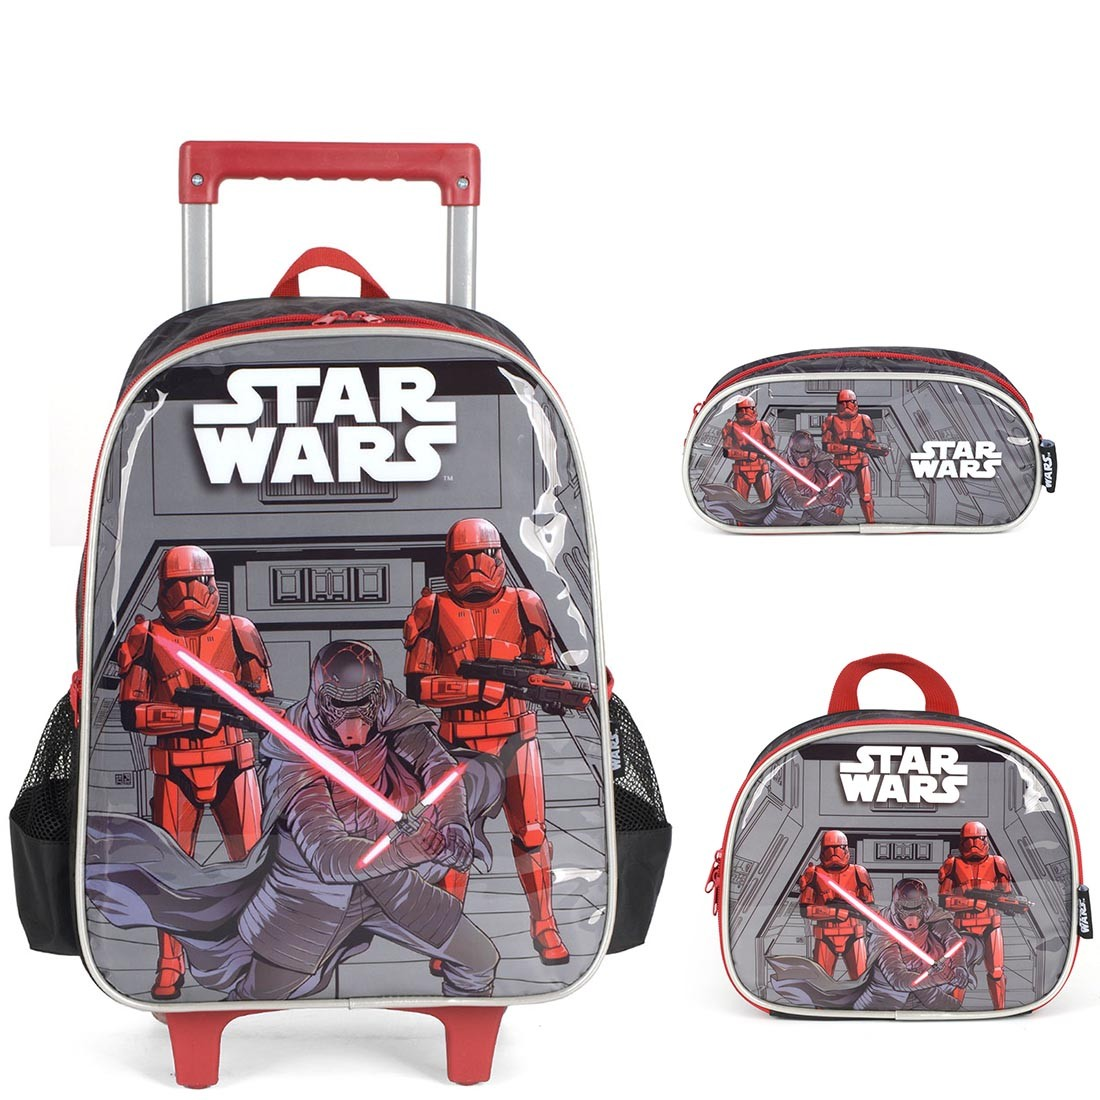 Kit Mochila Infantil Star Wars com Lancheira e Estojo Duplo Cinza